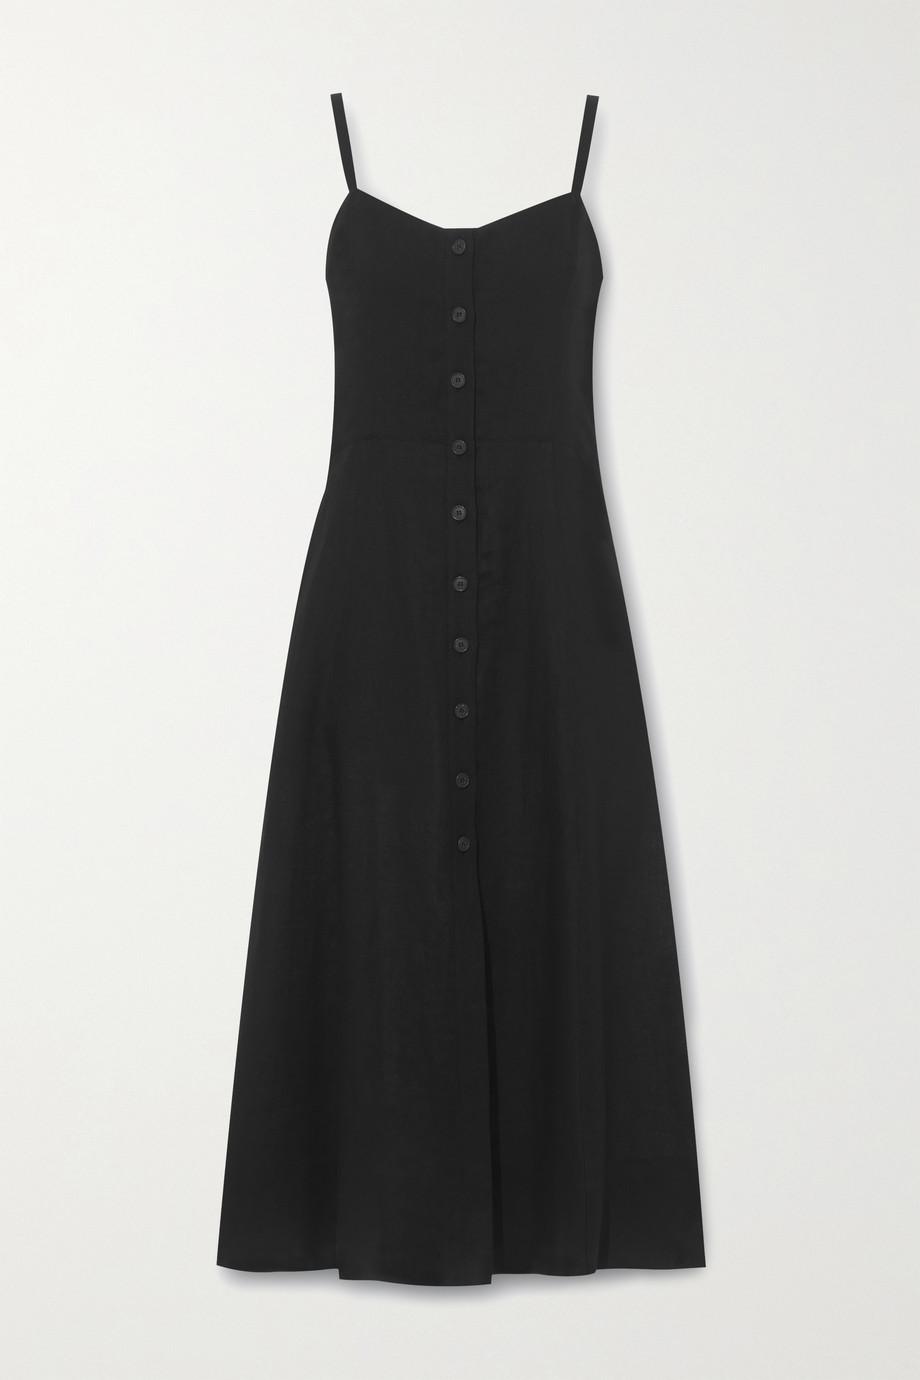 Three Graces London Bonita linen midi dress